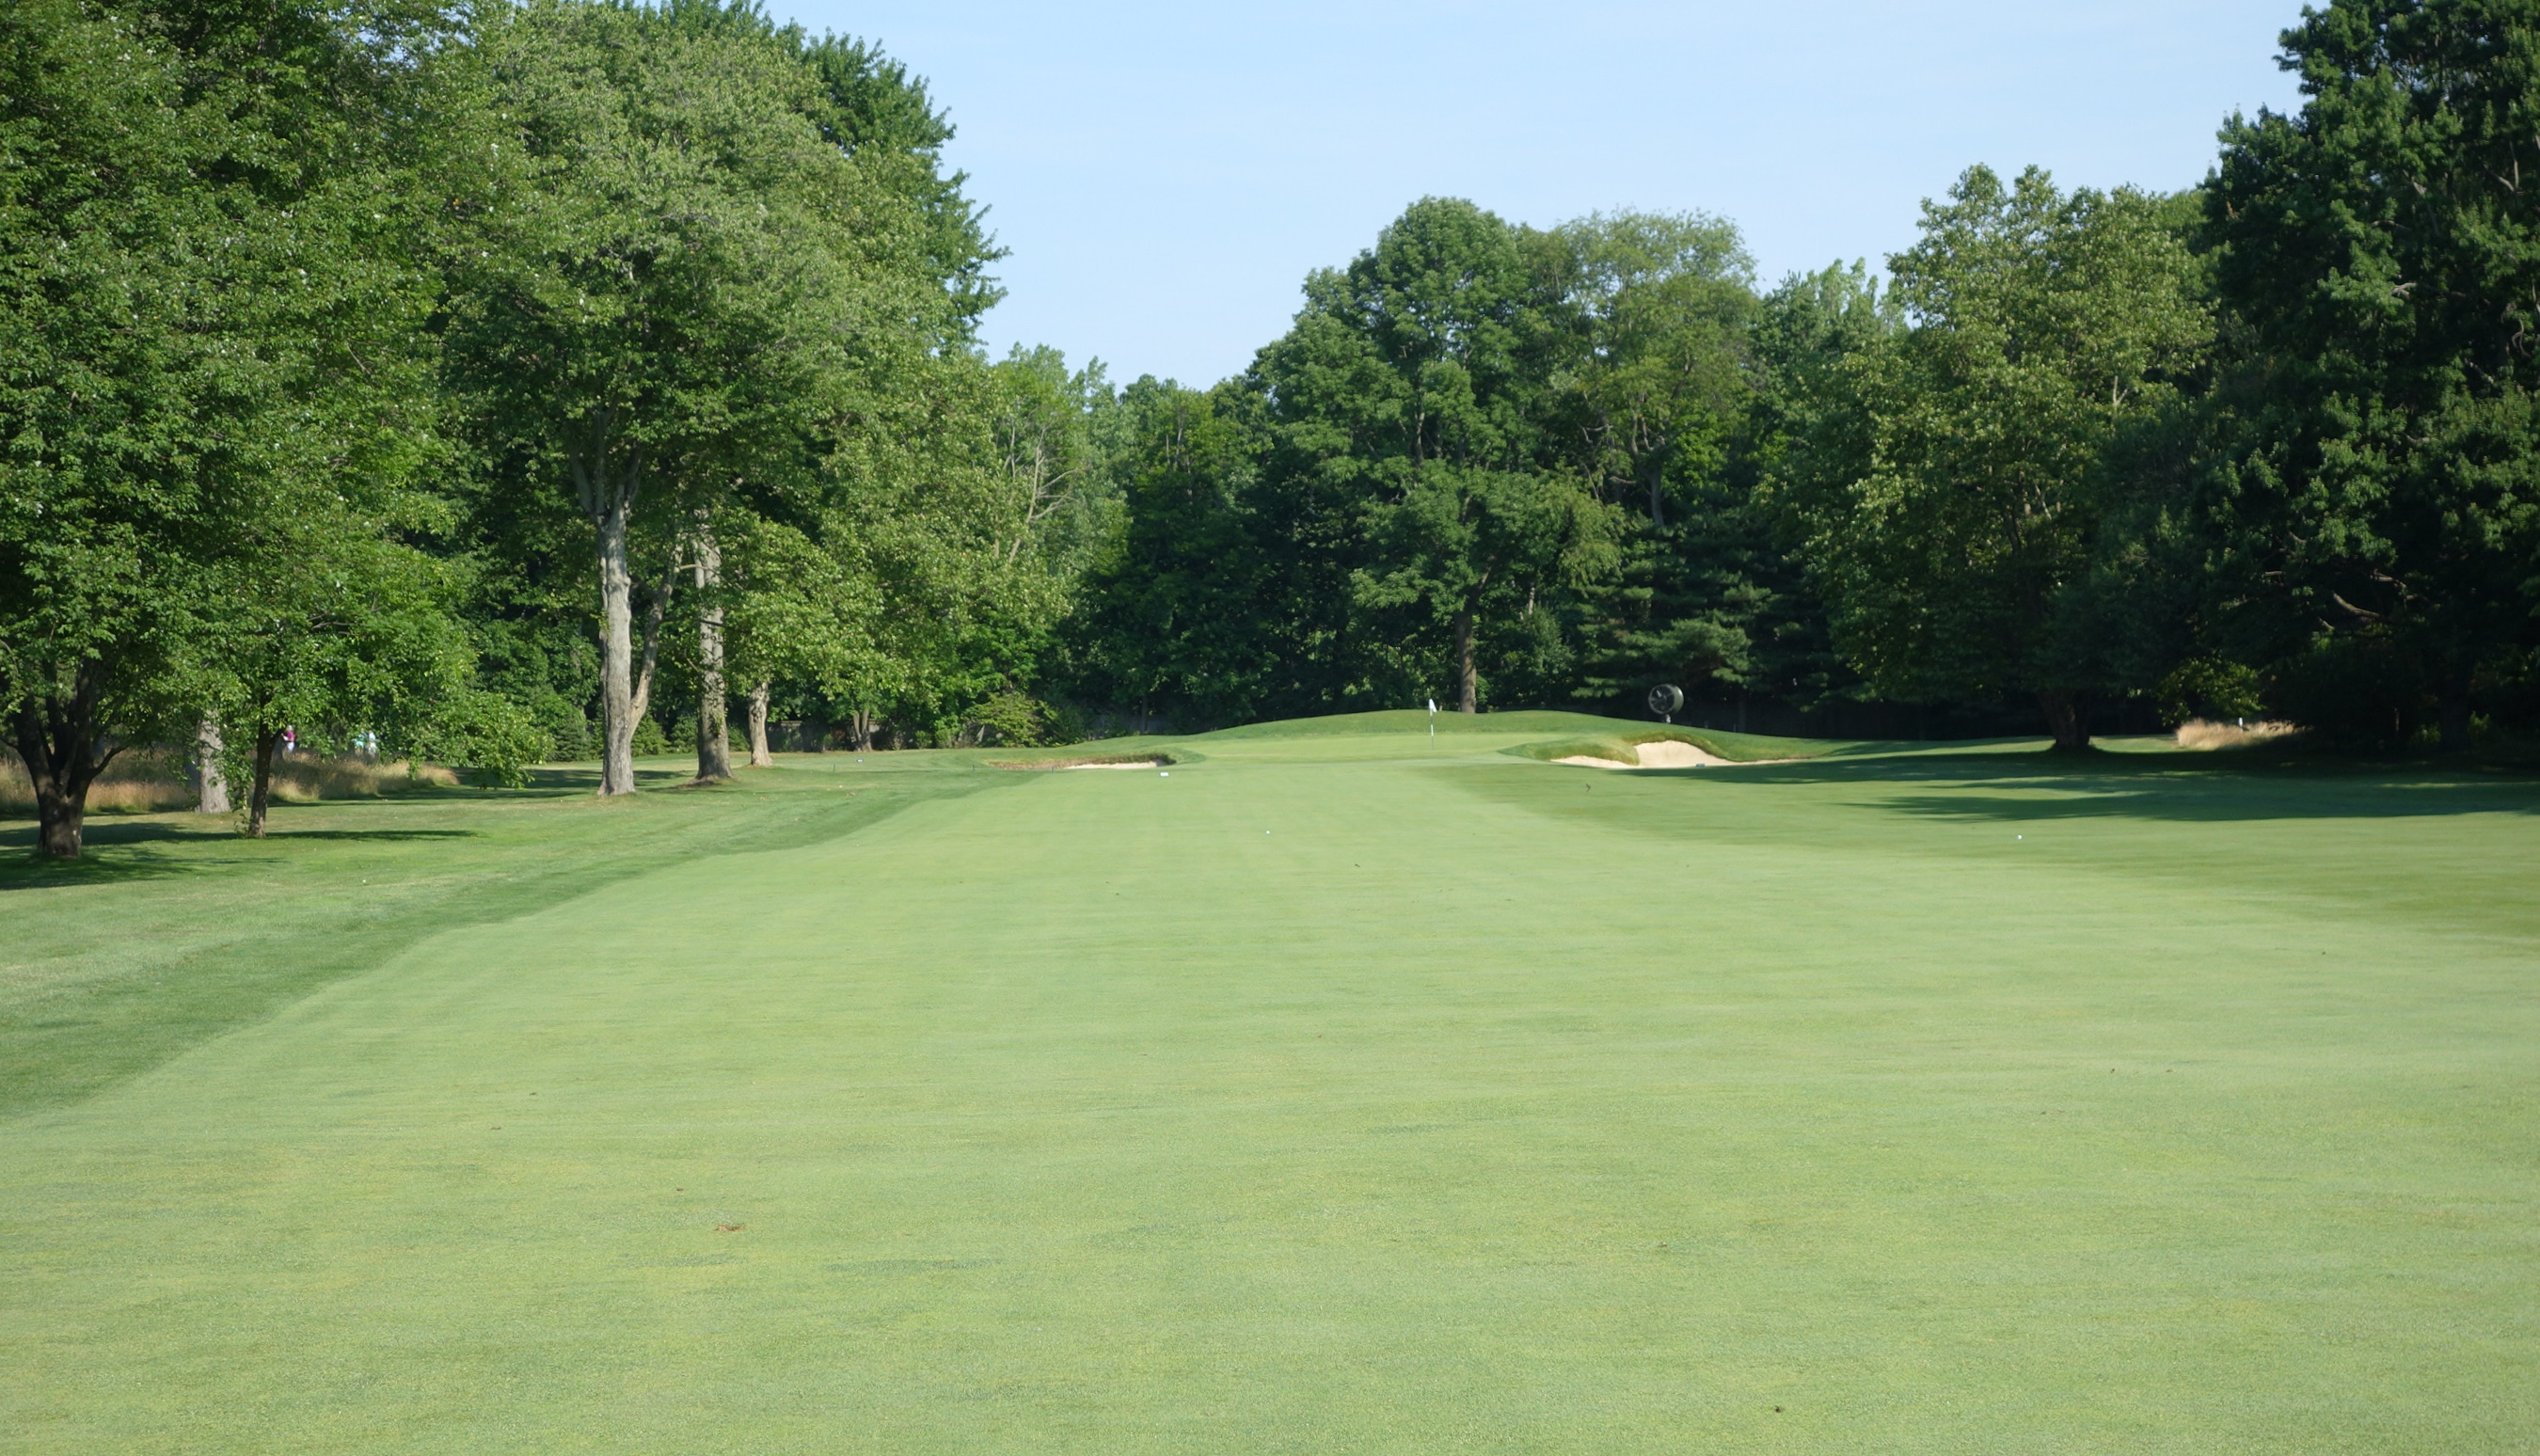 quaker ridge golf club review graylyn loomis